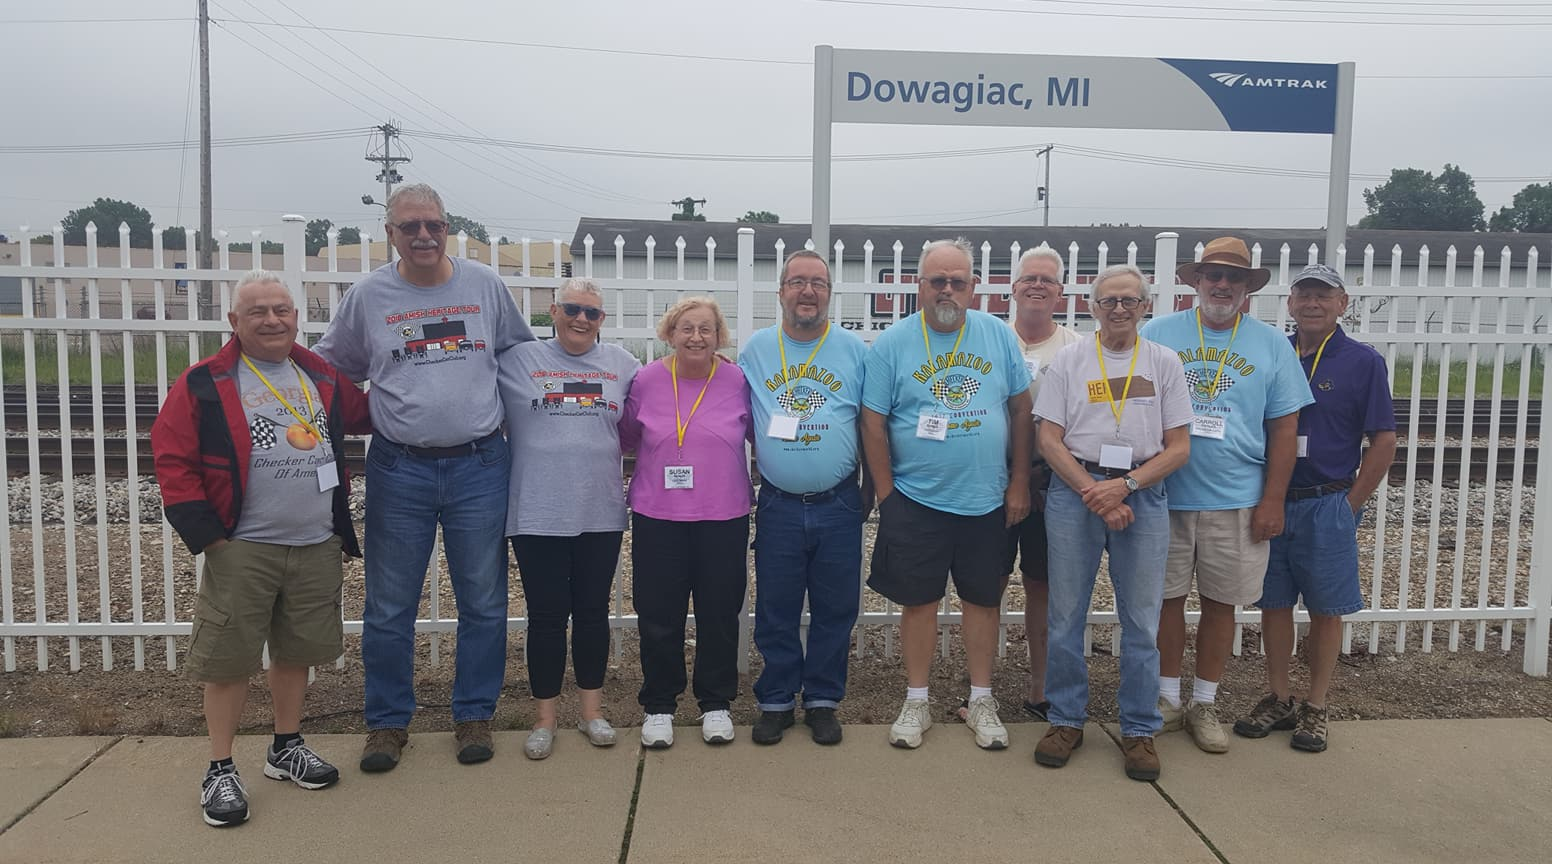 Dowagiac Group